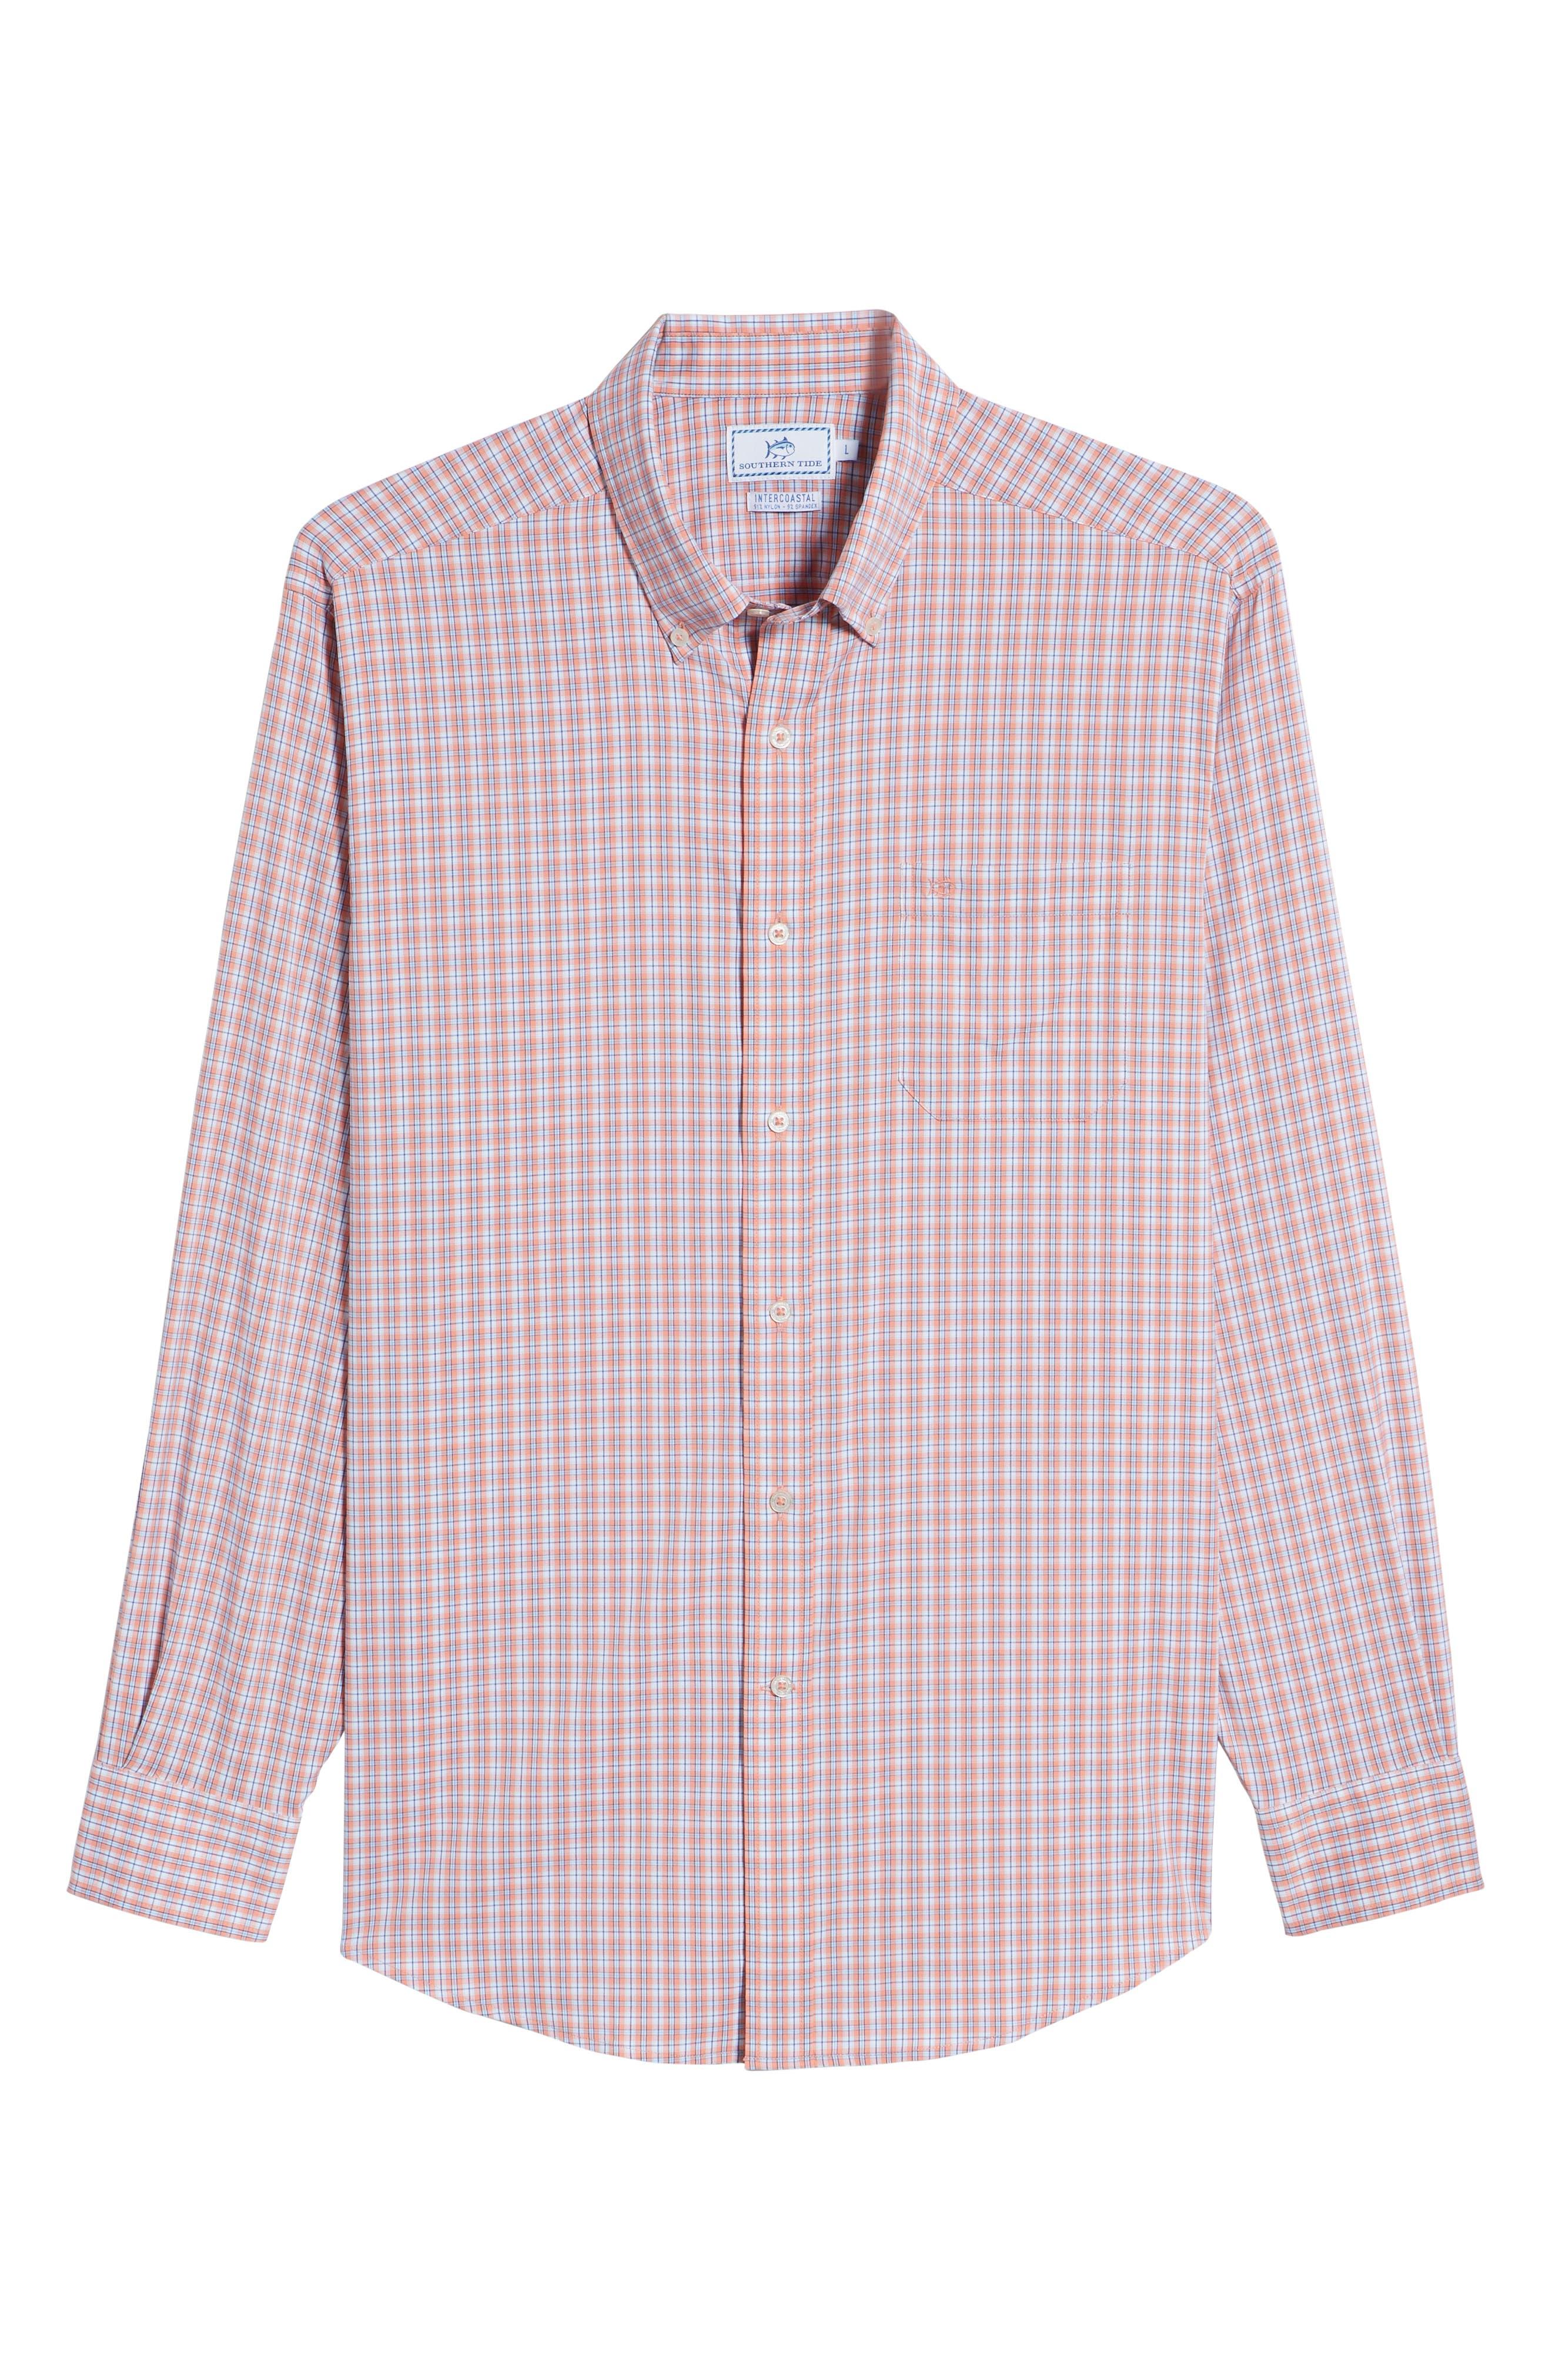 Grand Turk Regular Fit Stretch Plaid Sport Shirt,                             Alternate thumbnail 6, color,